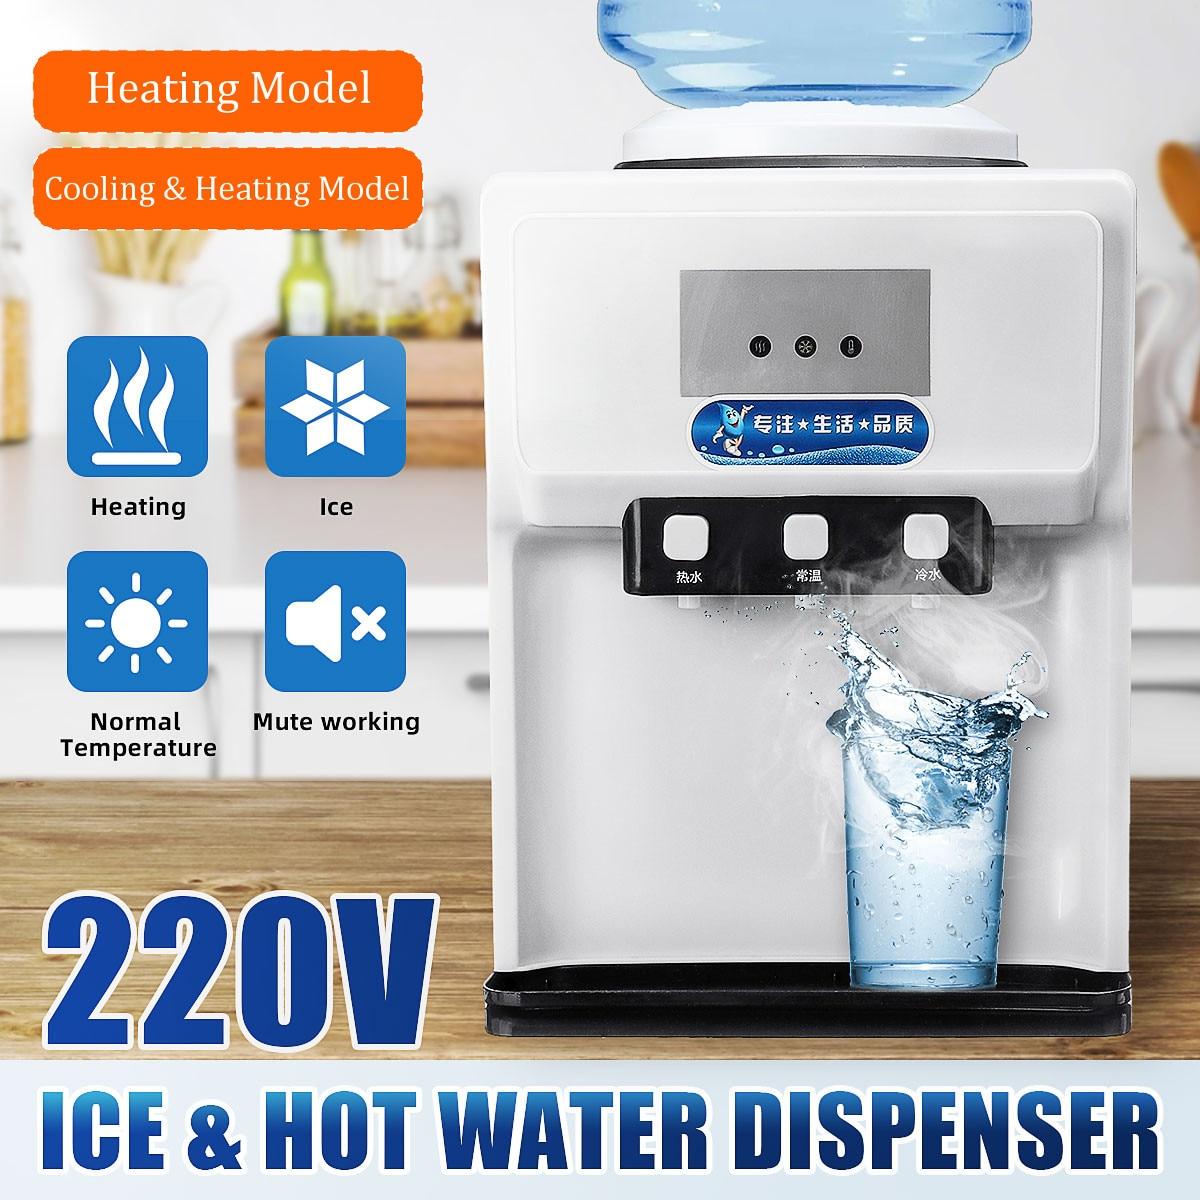 500W Warm Hot Drink Machine Drink Water Dispenser Desktop Water Holder Heating Cooling Water Fountains Boiler Drinkware Tools|Water Dispensers| - AliExpress